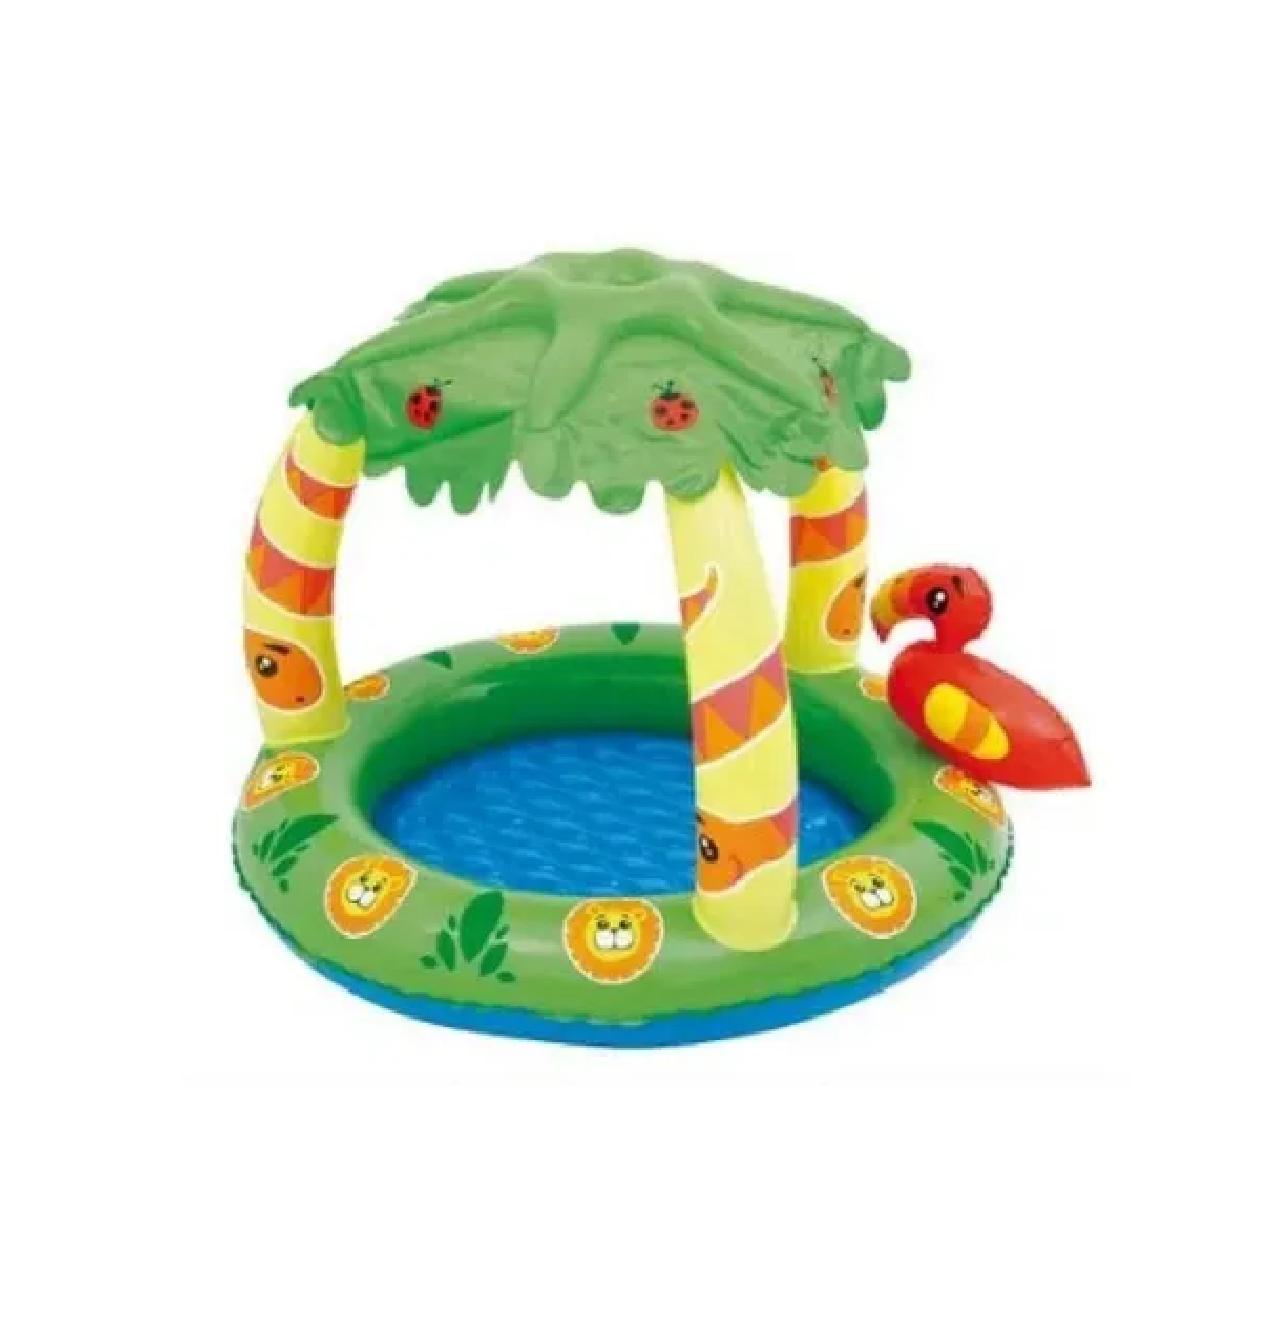 Banheira Tropical Bebe Infantil Piscina Banho Boia 45l Mor